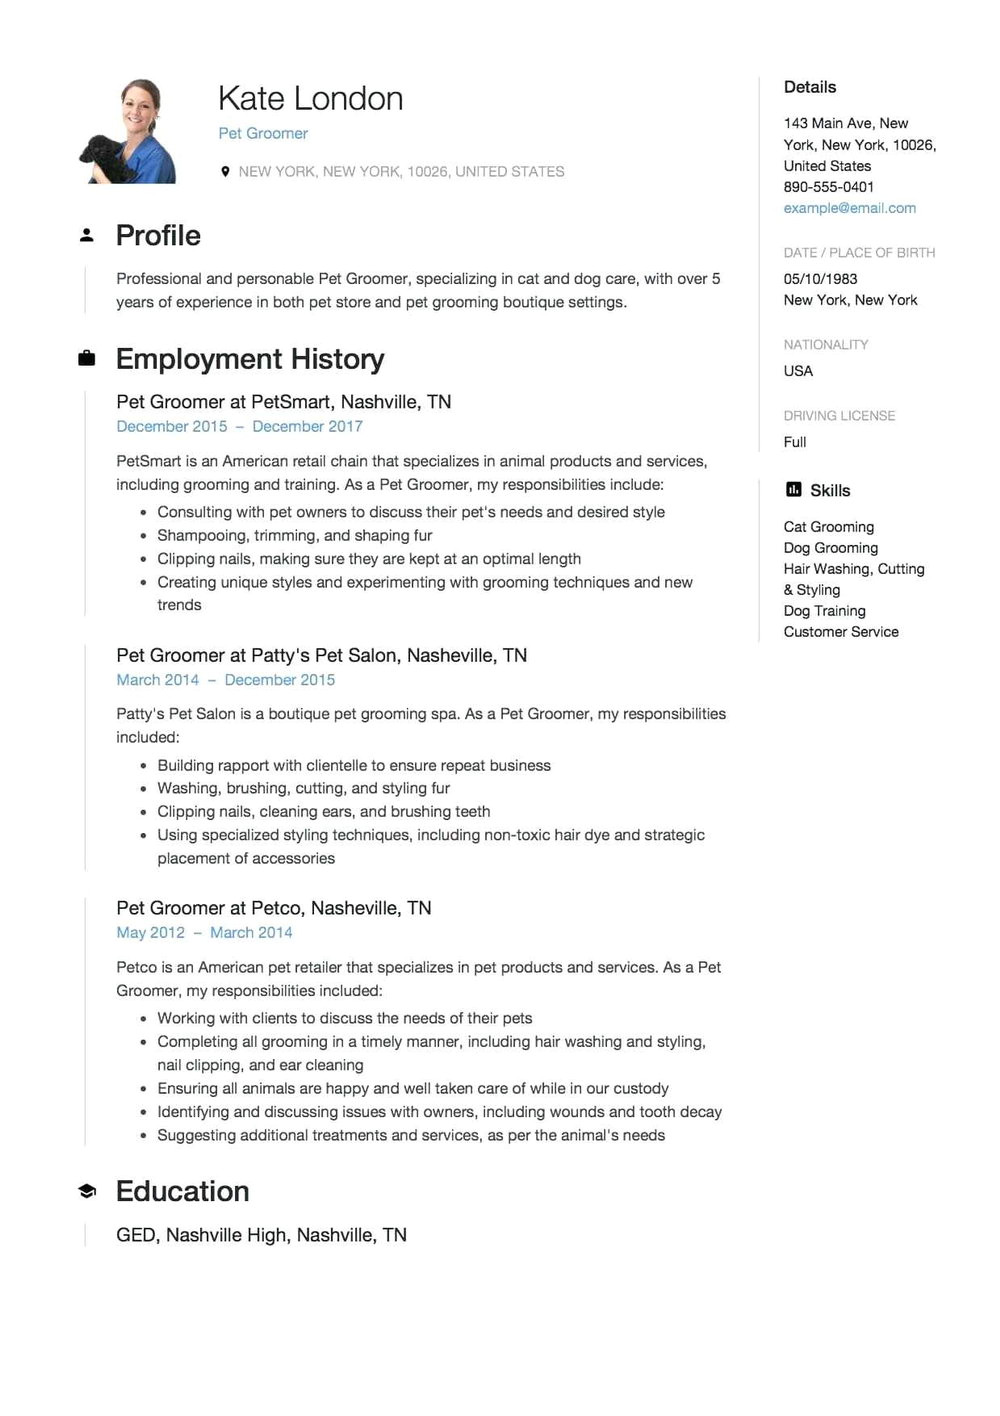 Normal Resume format Download In Ms Word 2007 Resume format Download In Ms Word 2007 World Of Reference